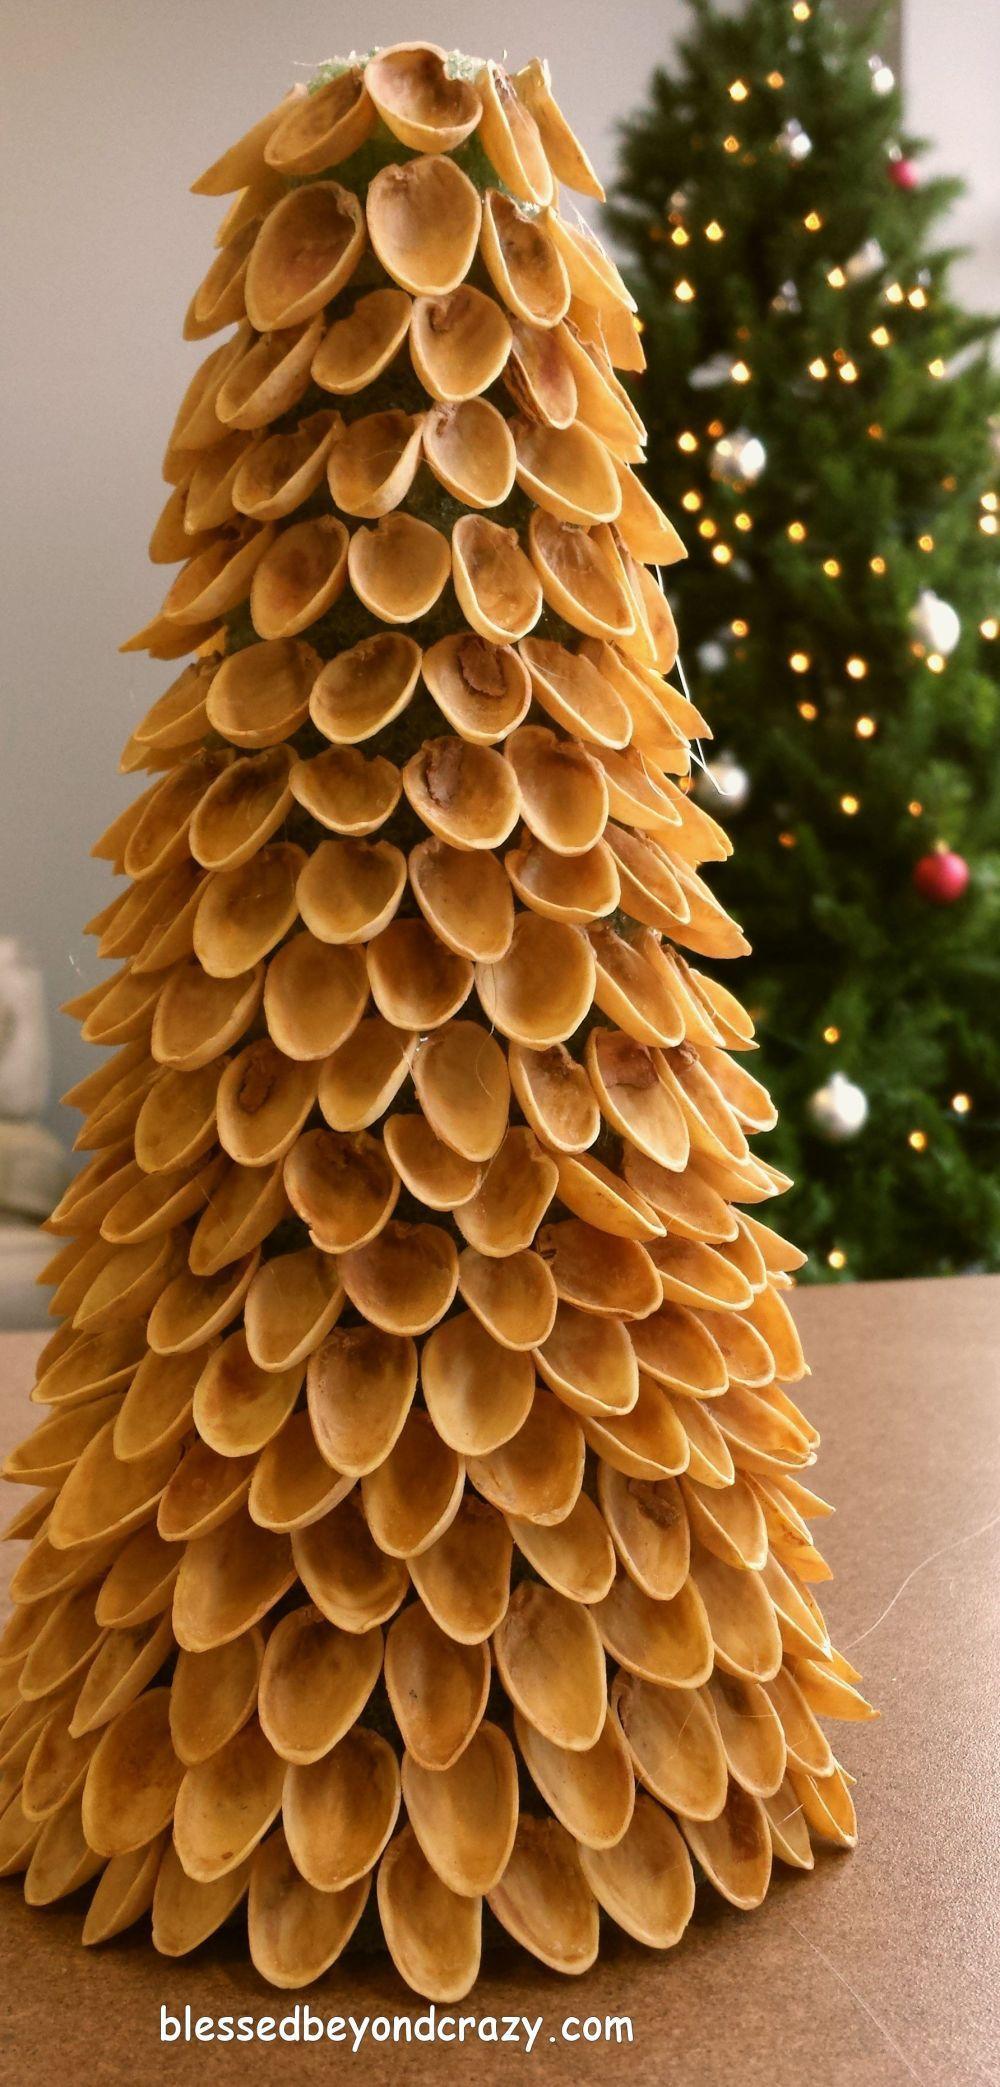 Pistachio Christmas Trees